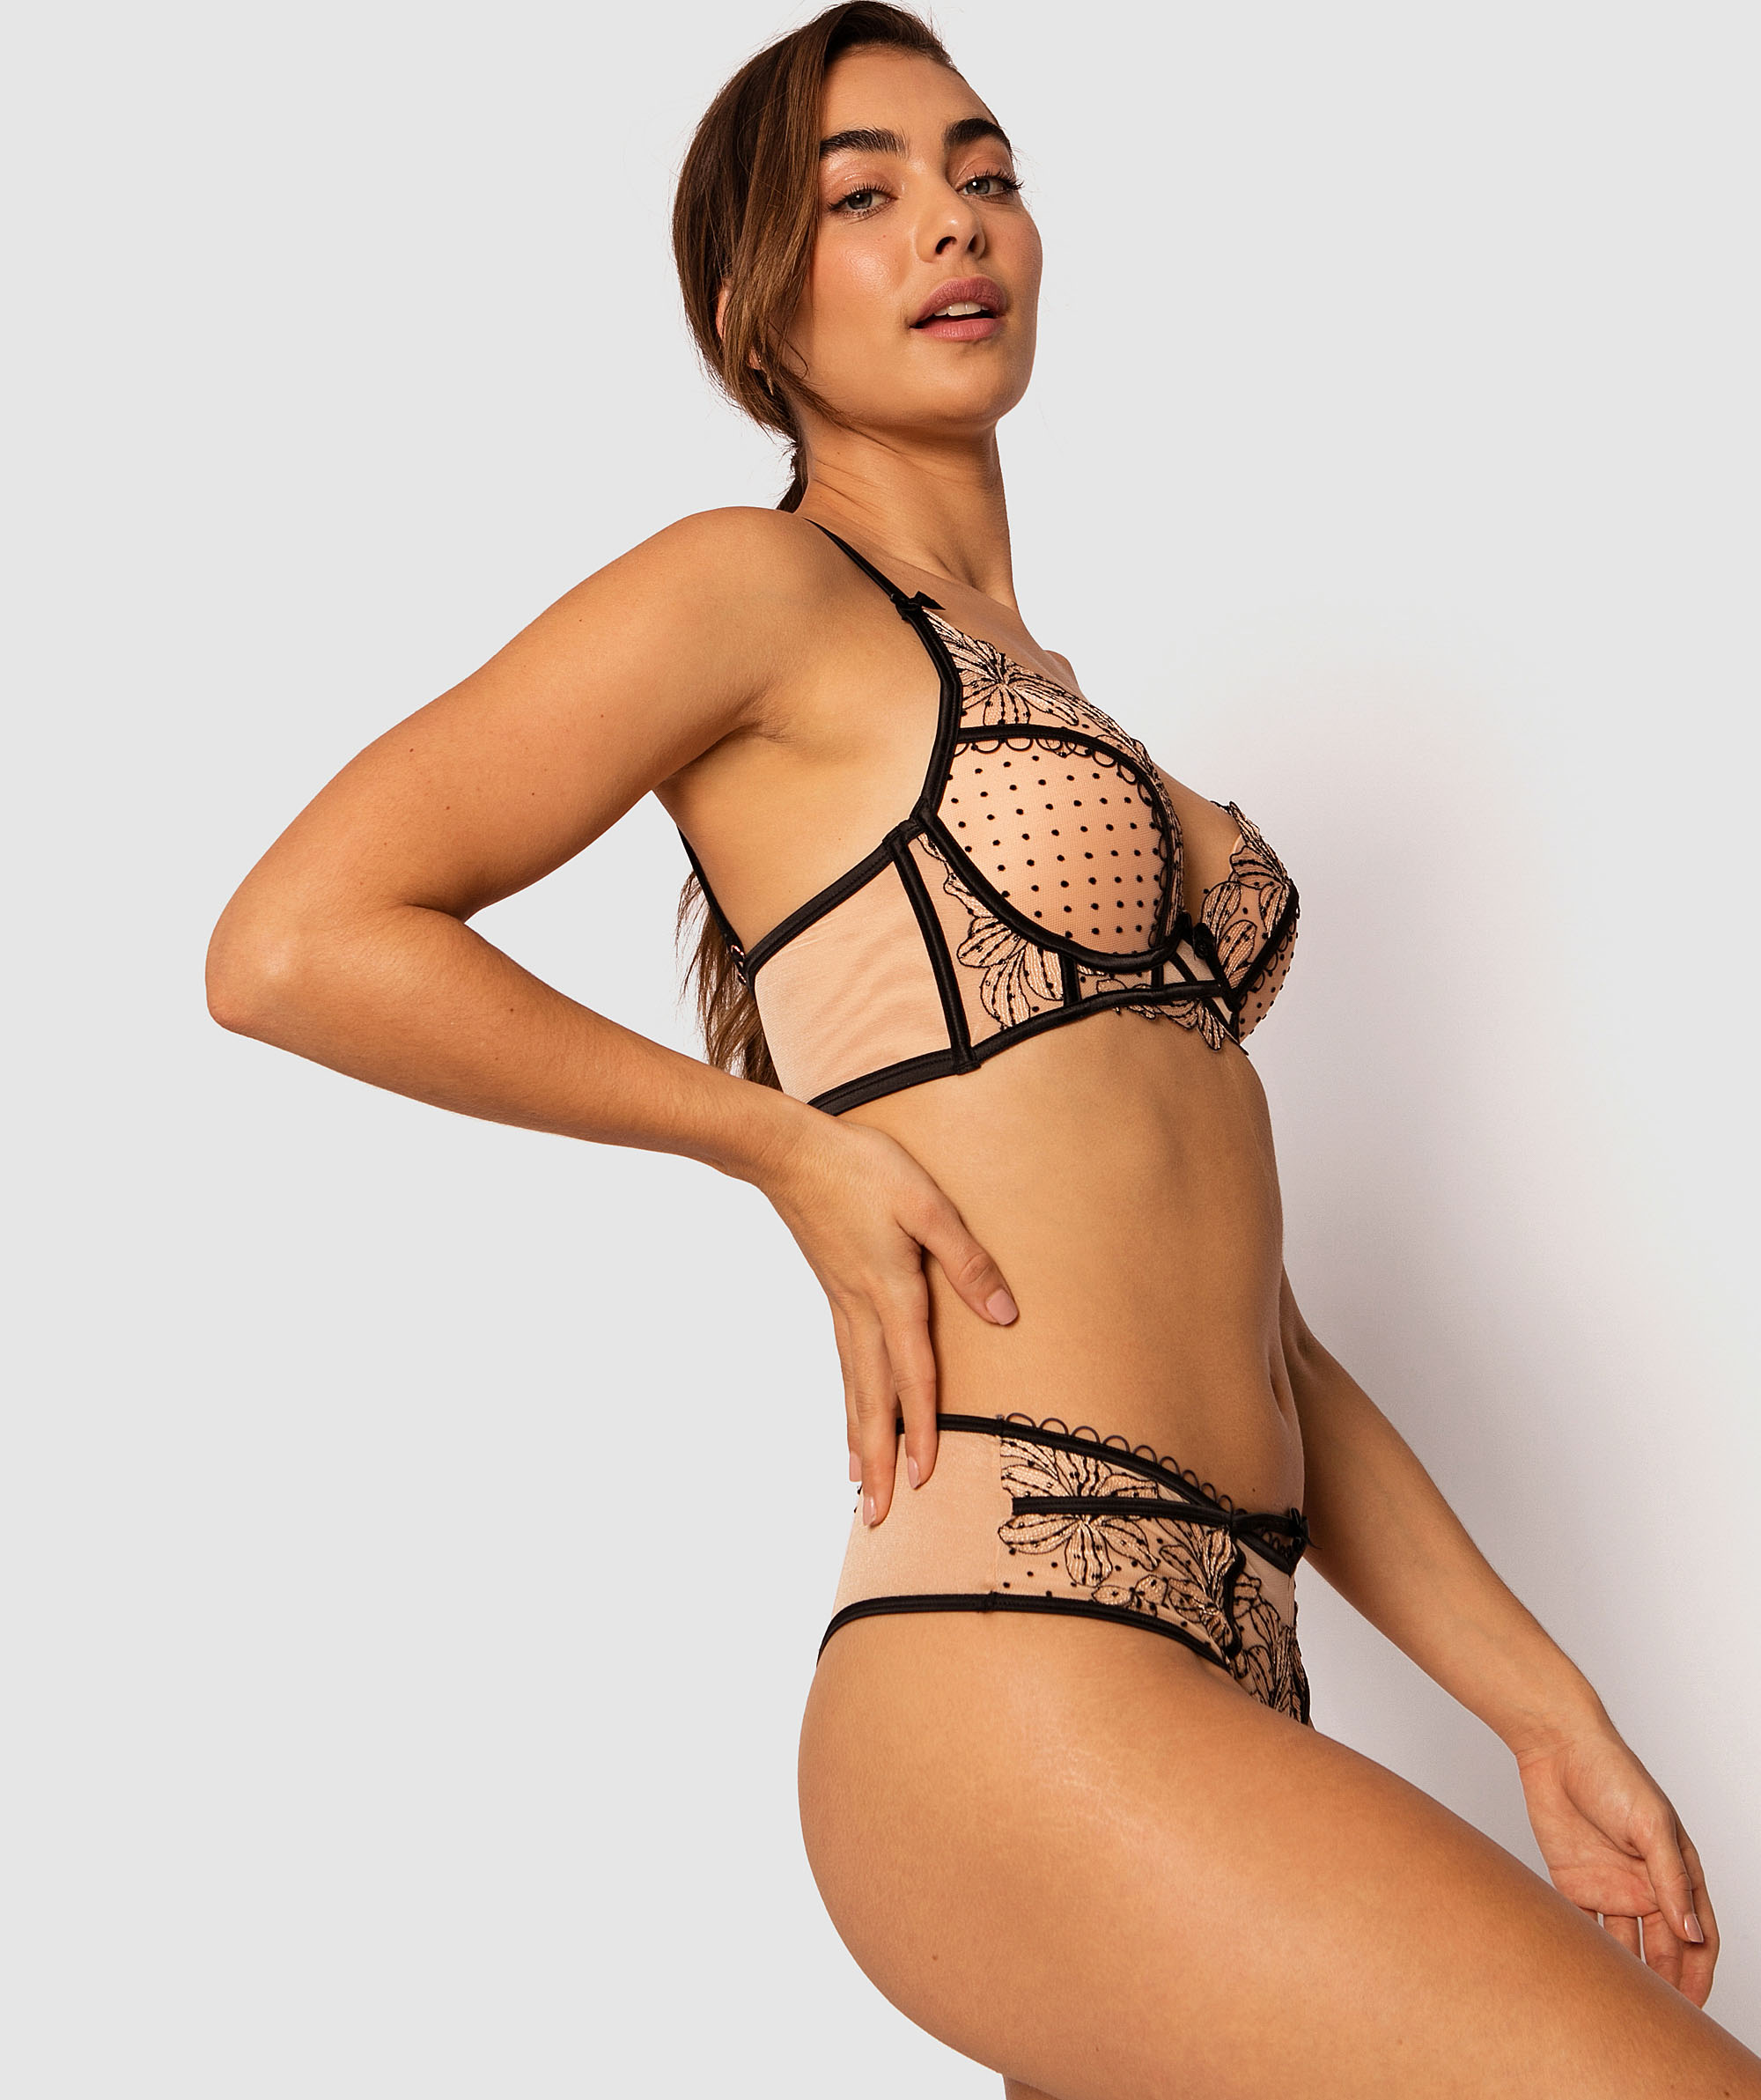 Enchanted Maiella High Waisted V String Knicker - Black/Nude